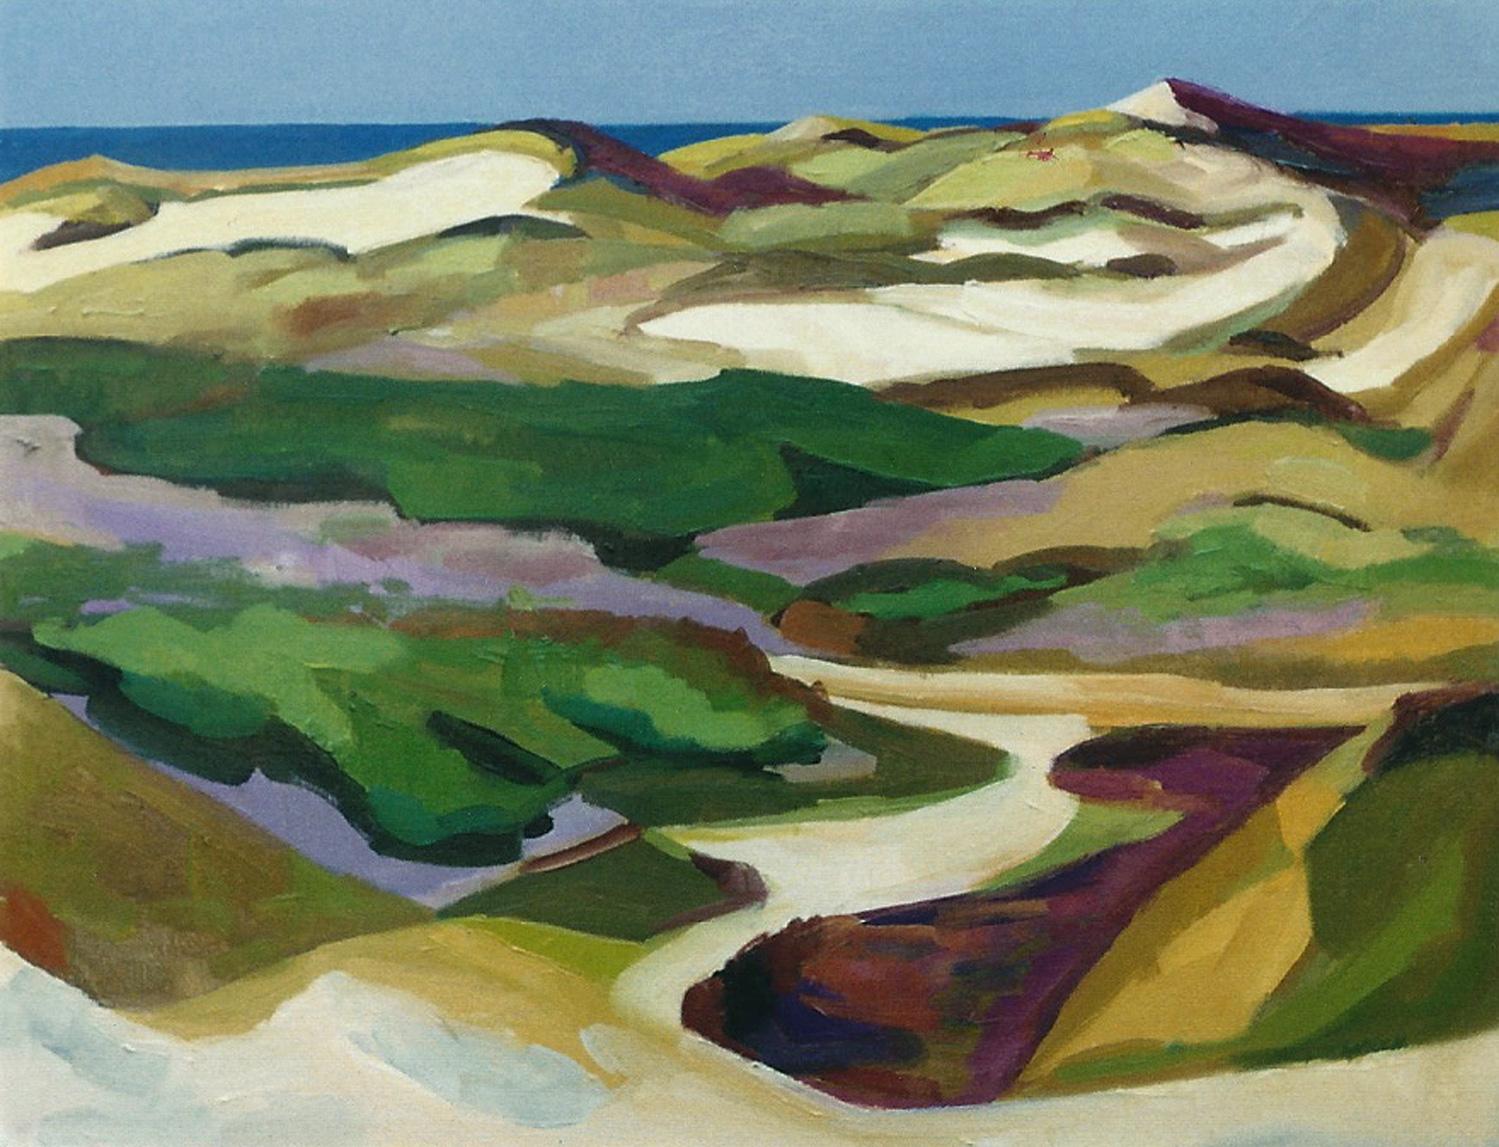 "Teresa Welch,  Truro Bowl II , oil/canvas, 19"" x 25"", 1993"